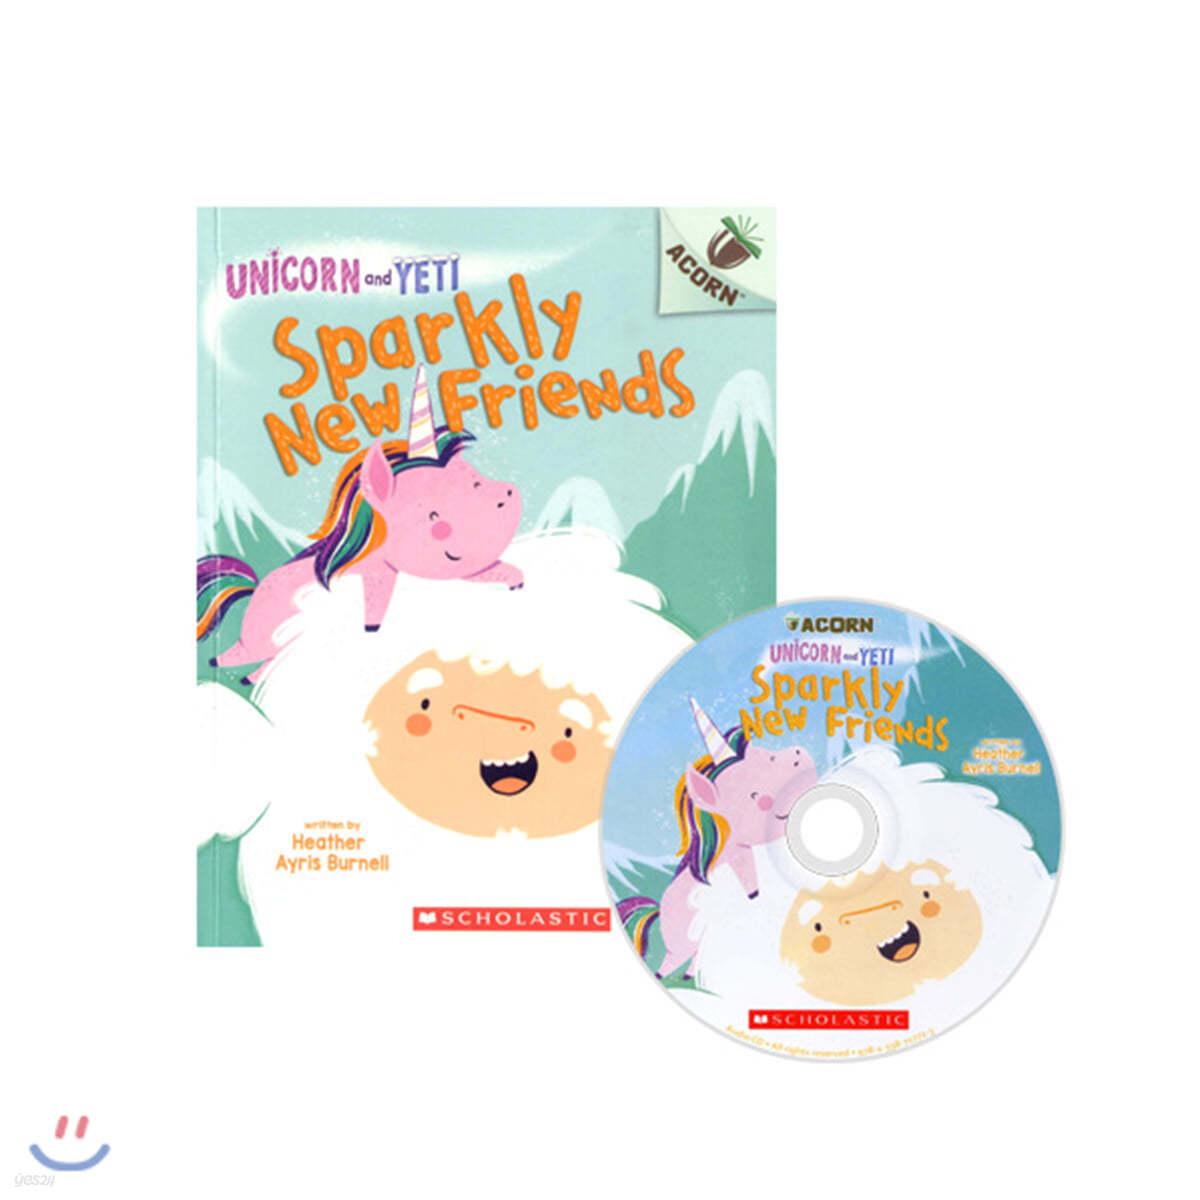 Unicorn And Yeti #1: Sparkly New Friends (CD & StoryPlus)